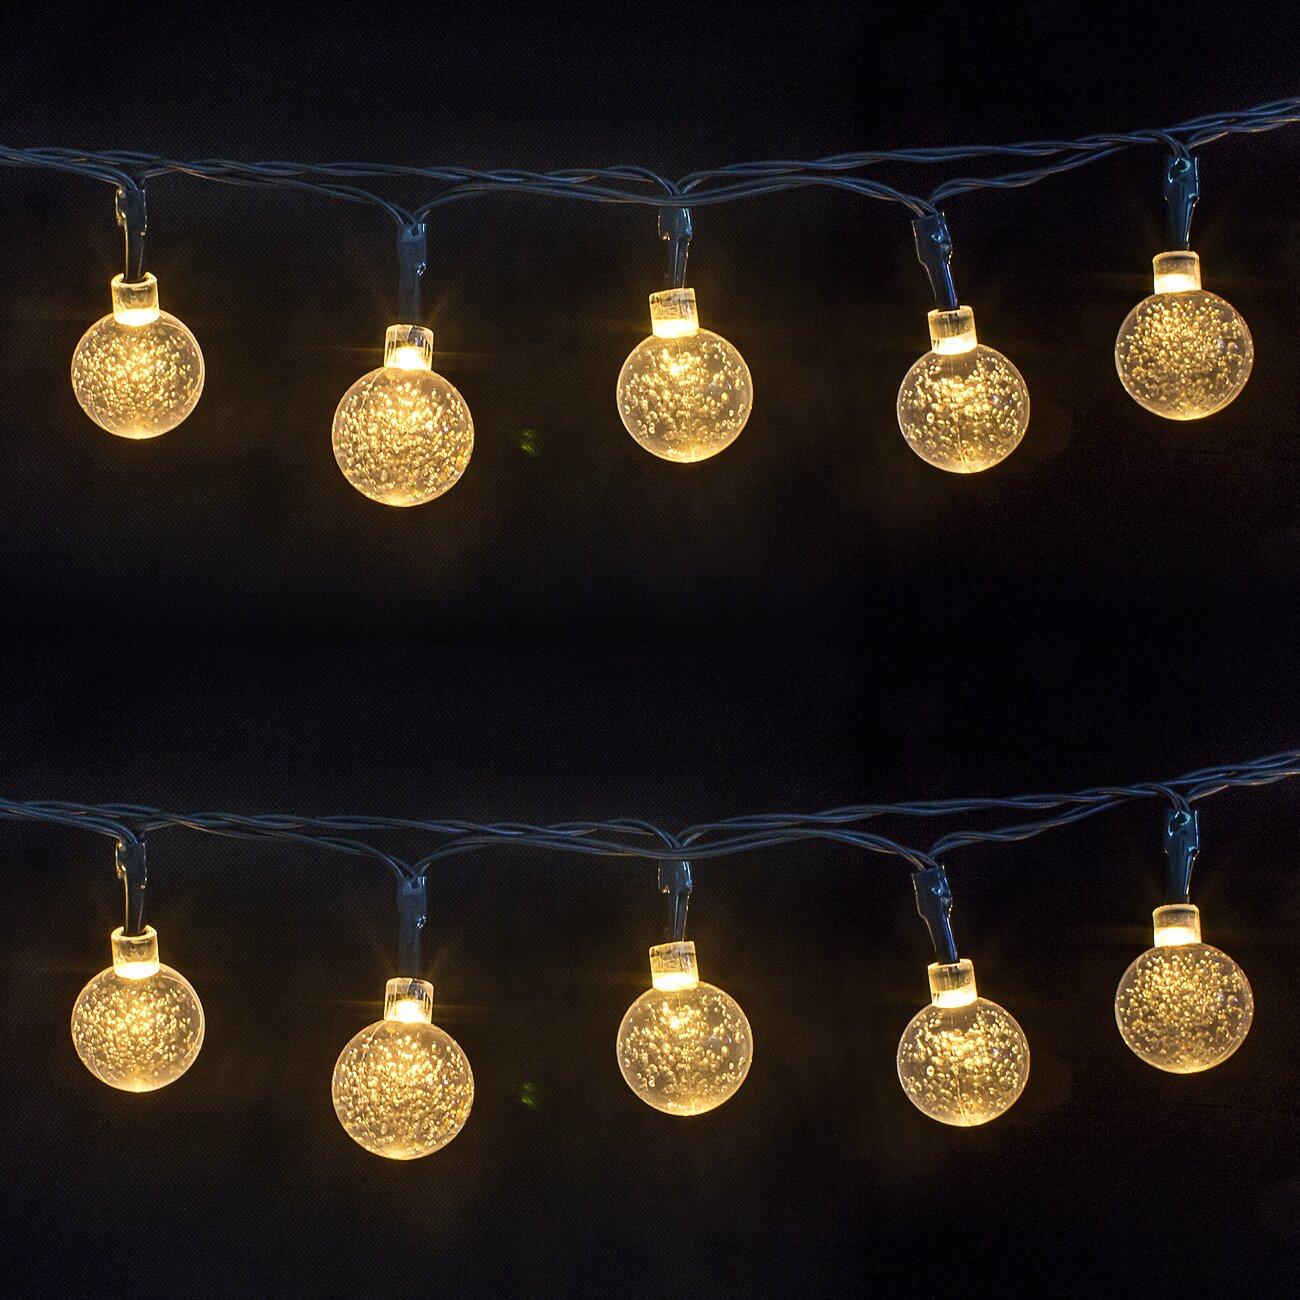 LED Concepts 30-Light 16 ft. Globe String Lights & Reviews Wayfair.ca